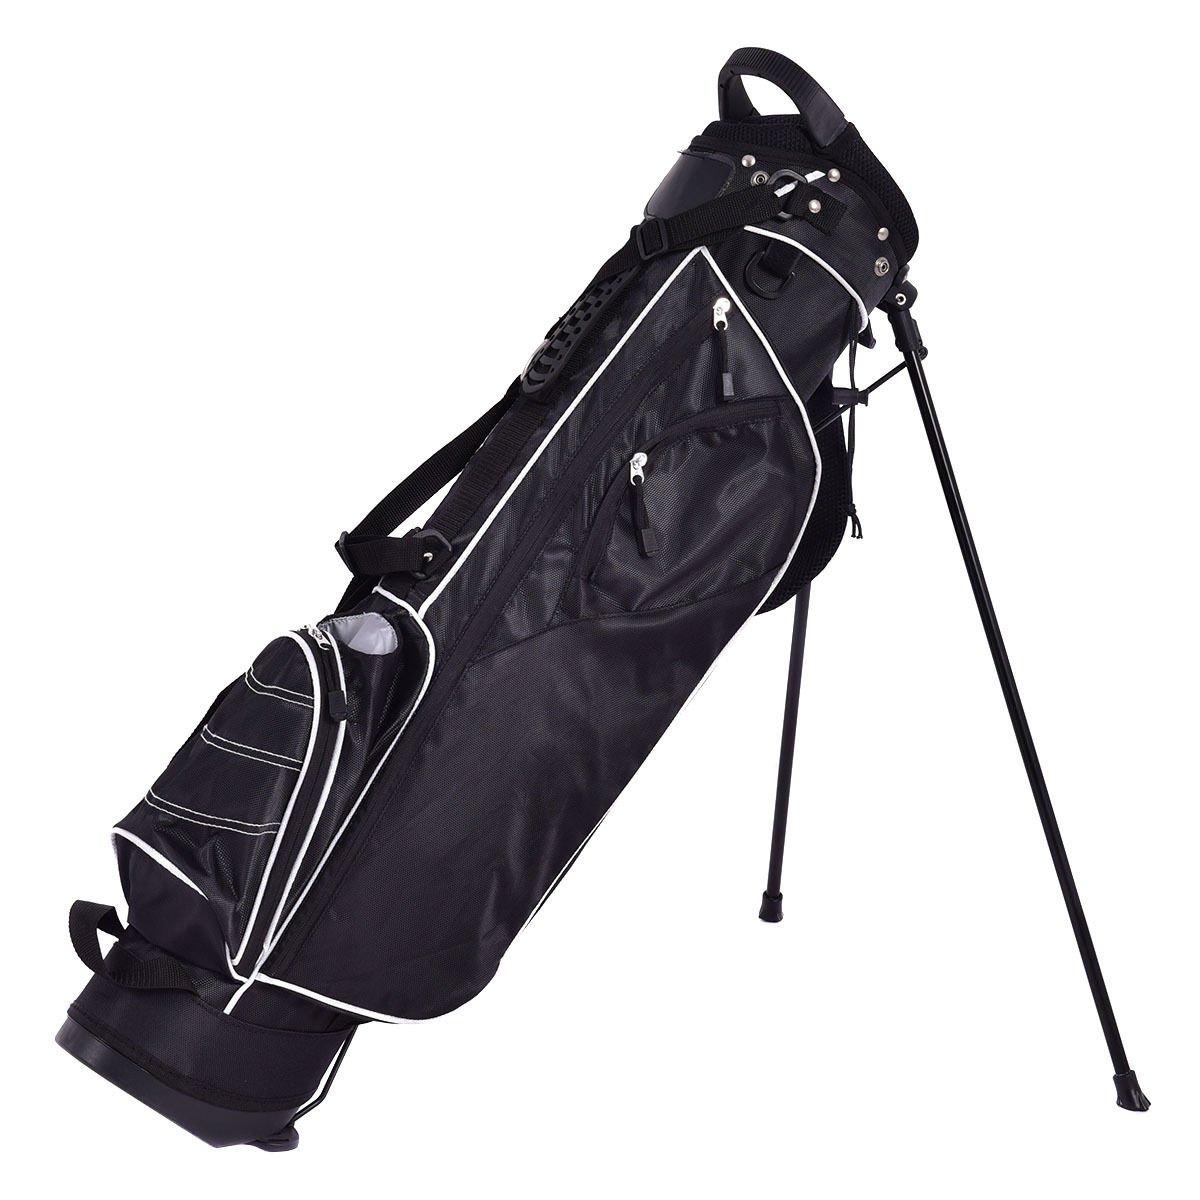 4 Way Divider Black Golf Stand Cart Bag